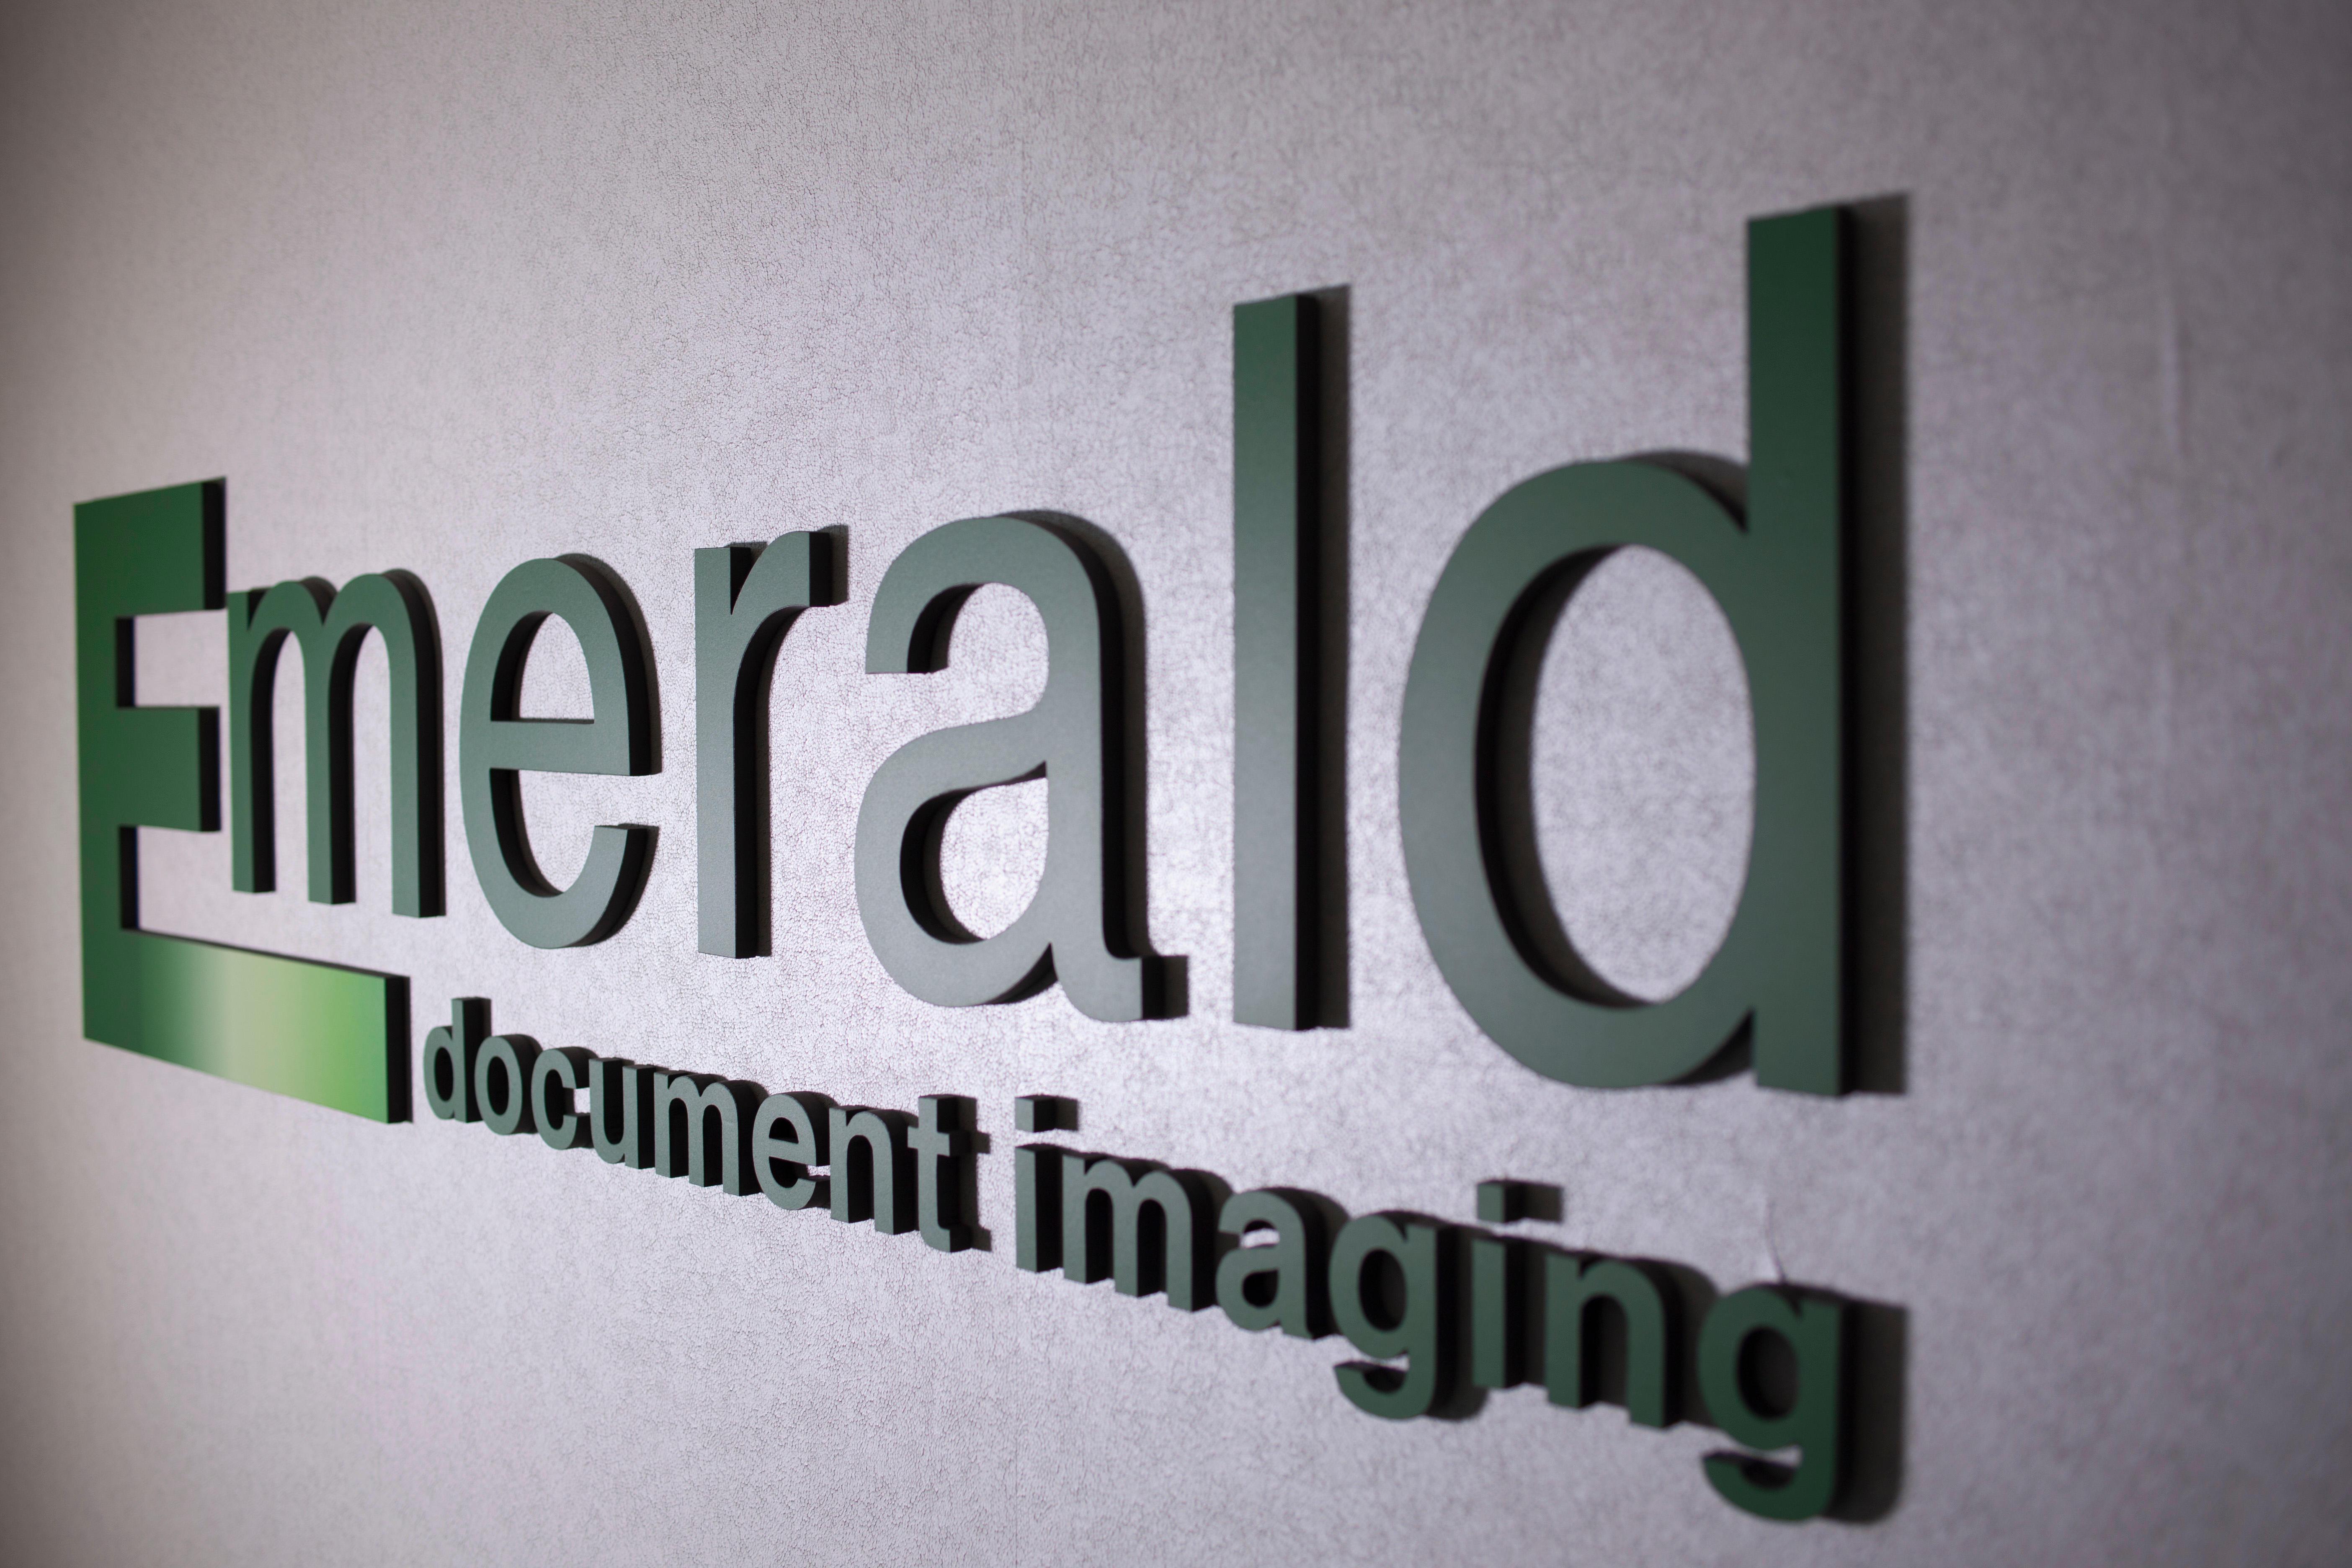 Emerald Document Imaging image 1